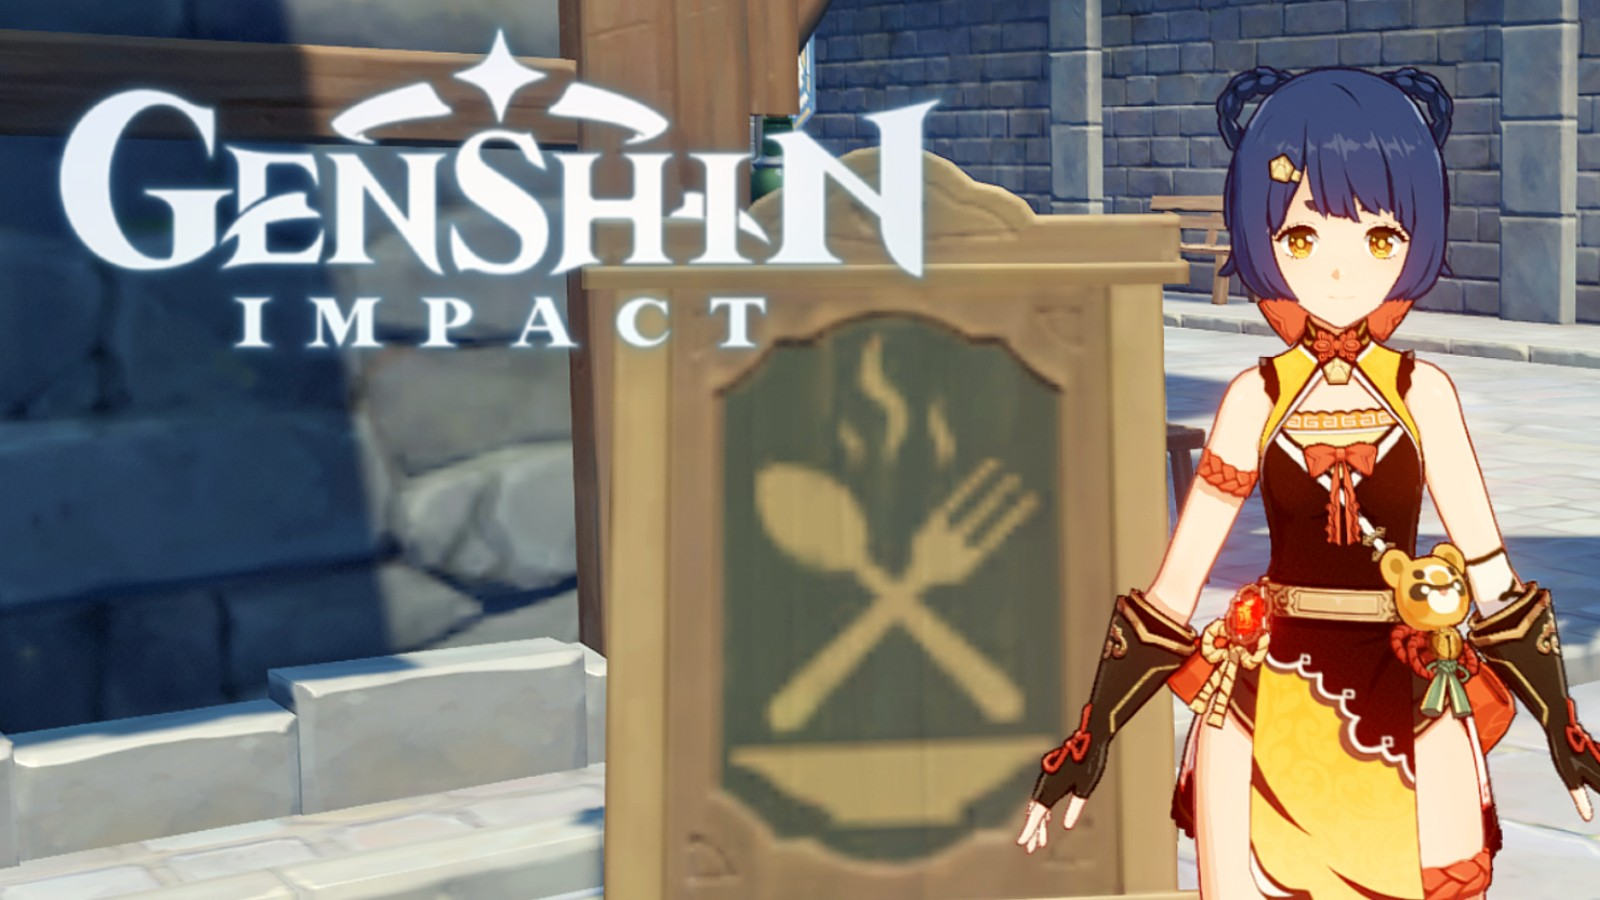 Genshin Impact character next to the logo